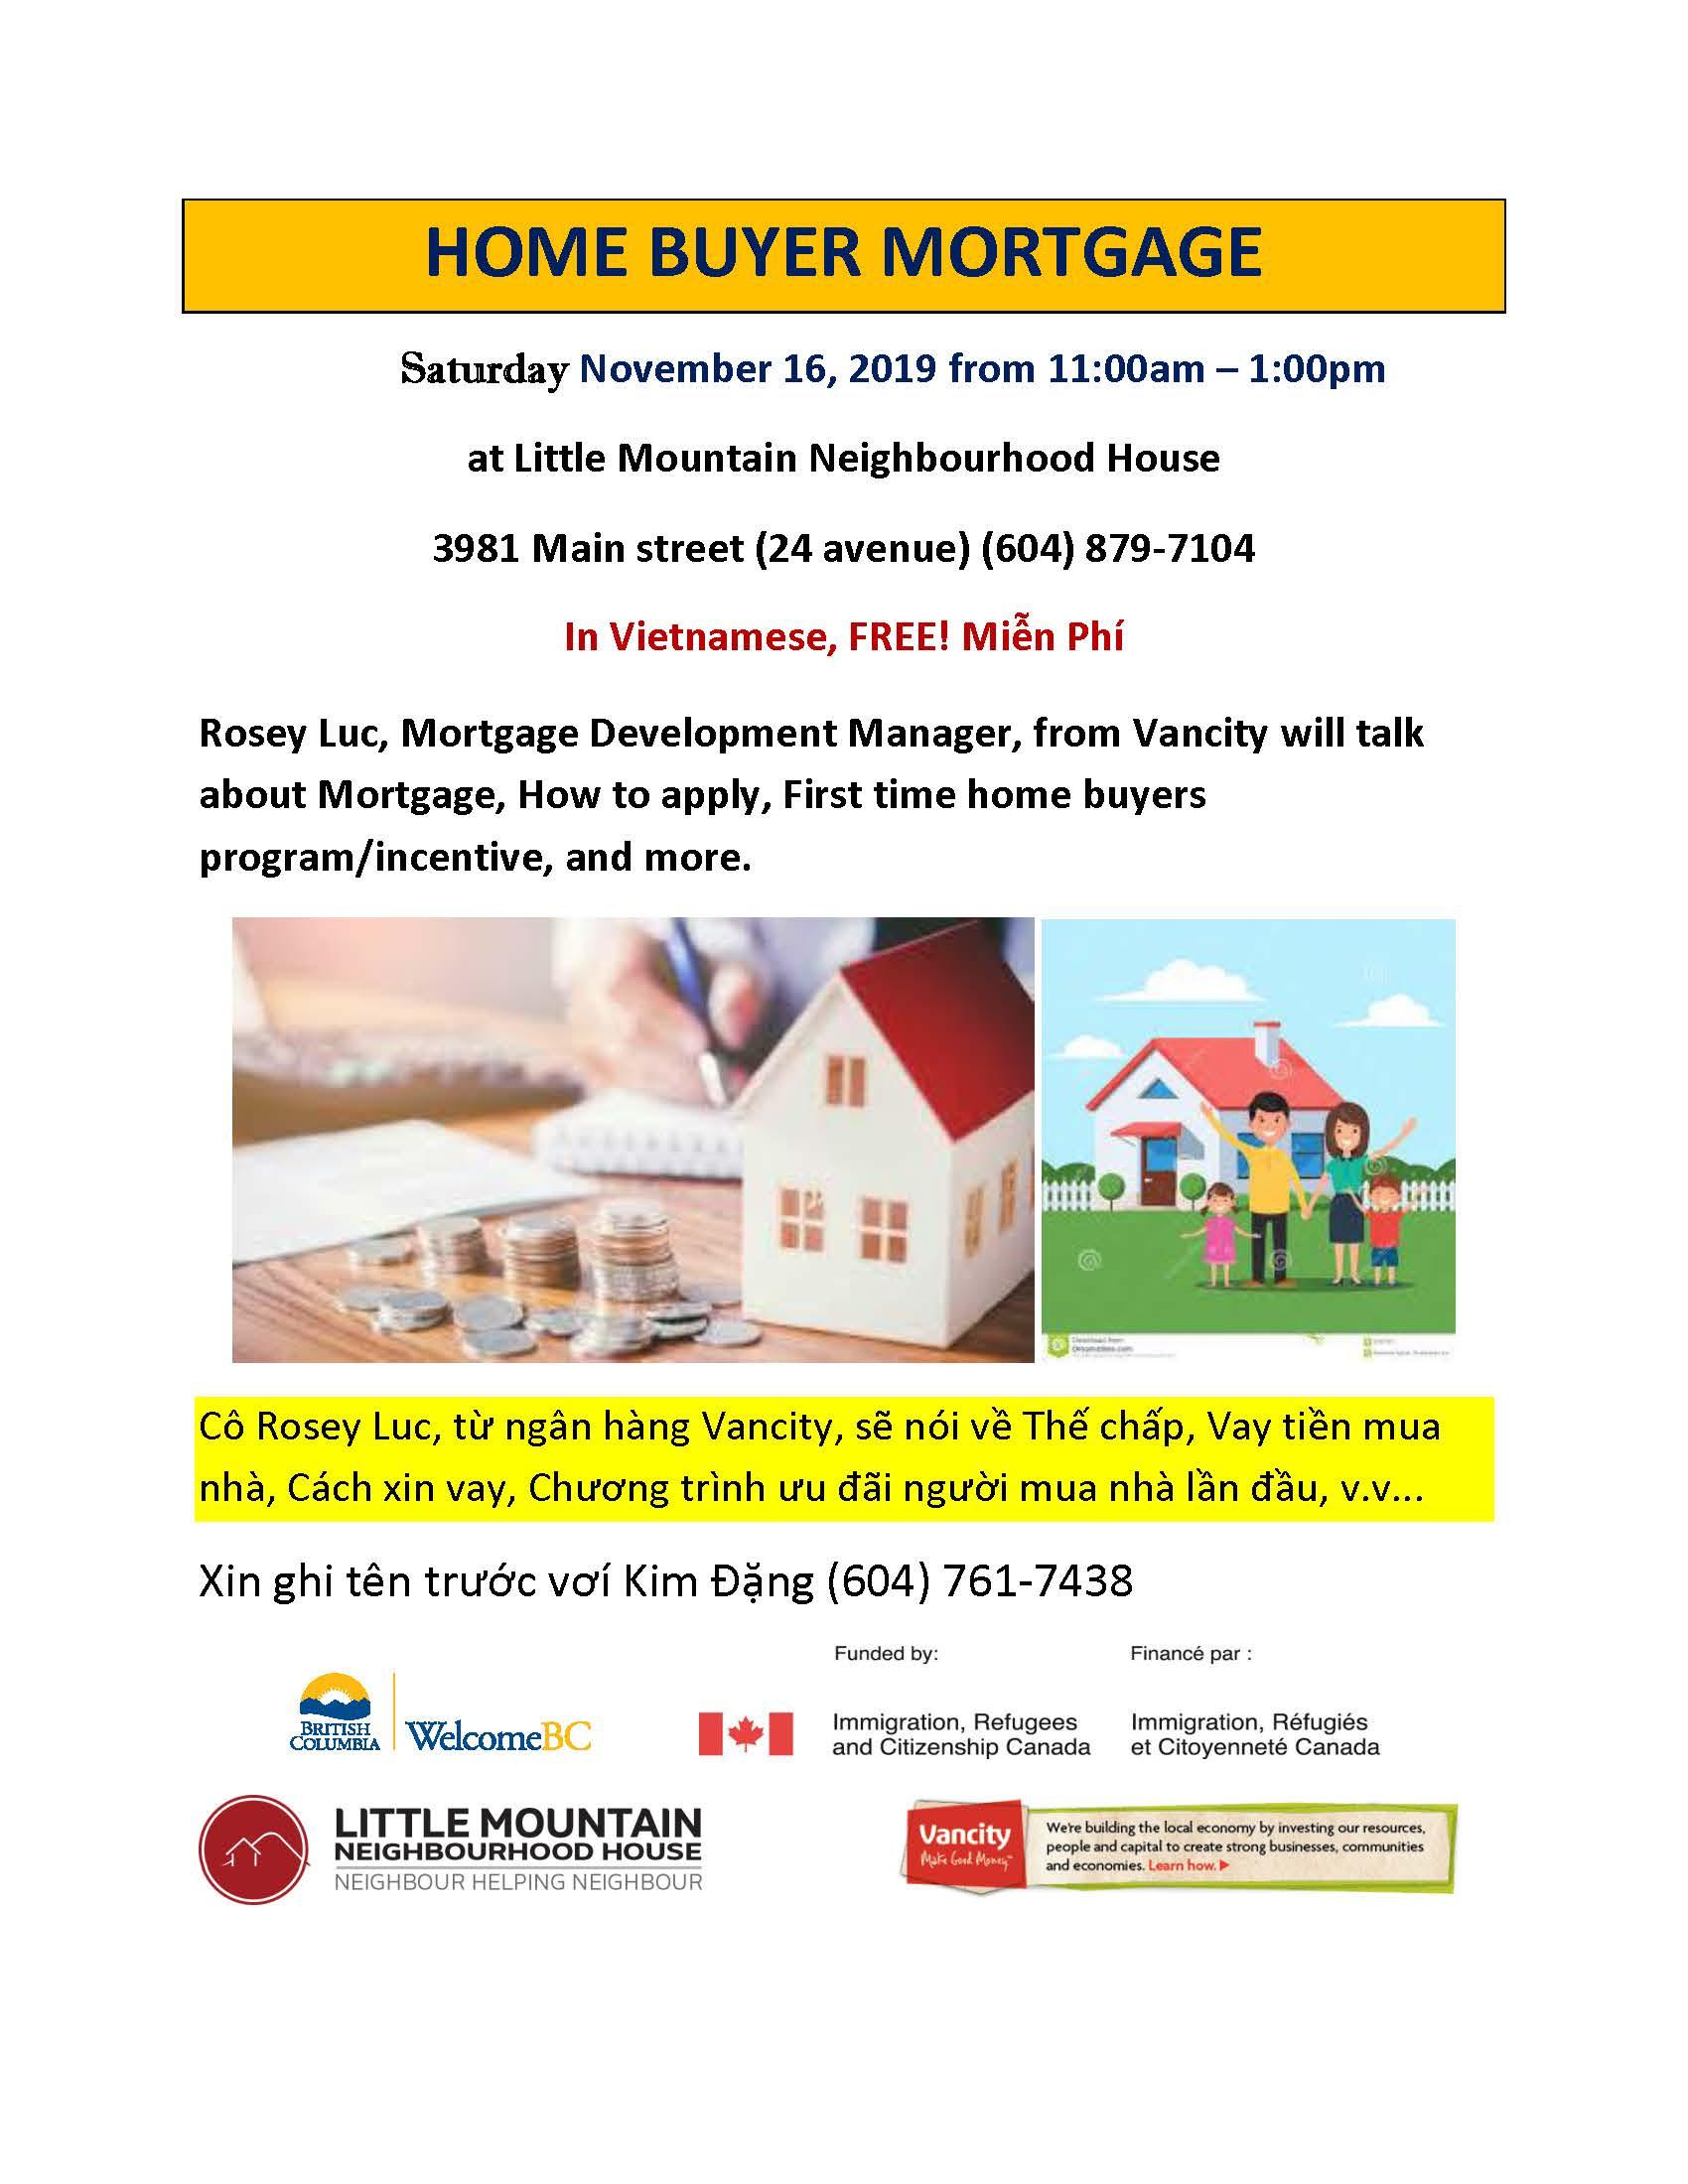 Homebuyers mortgage